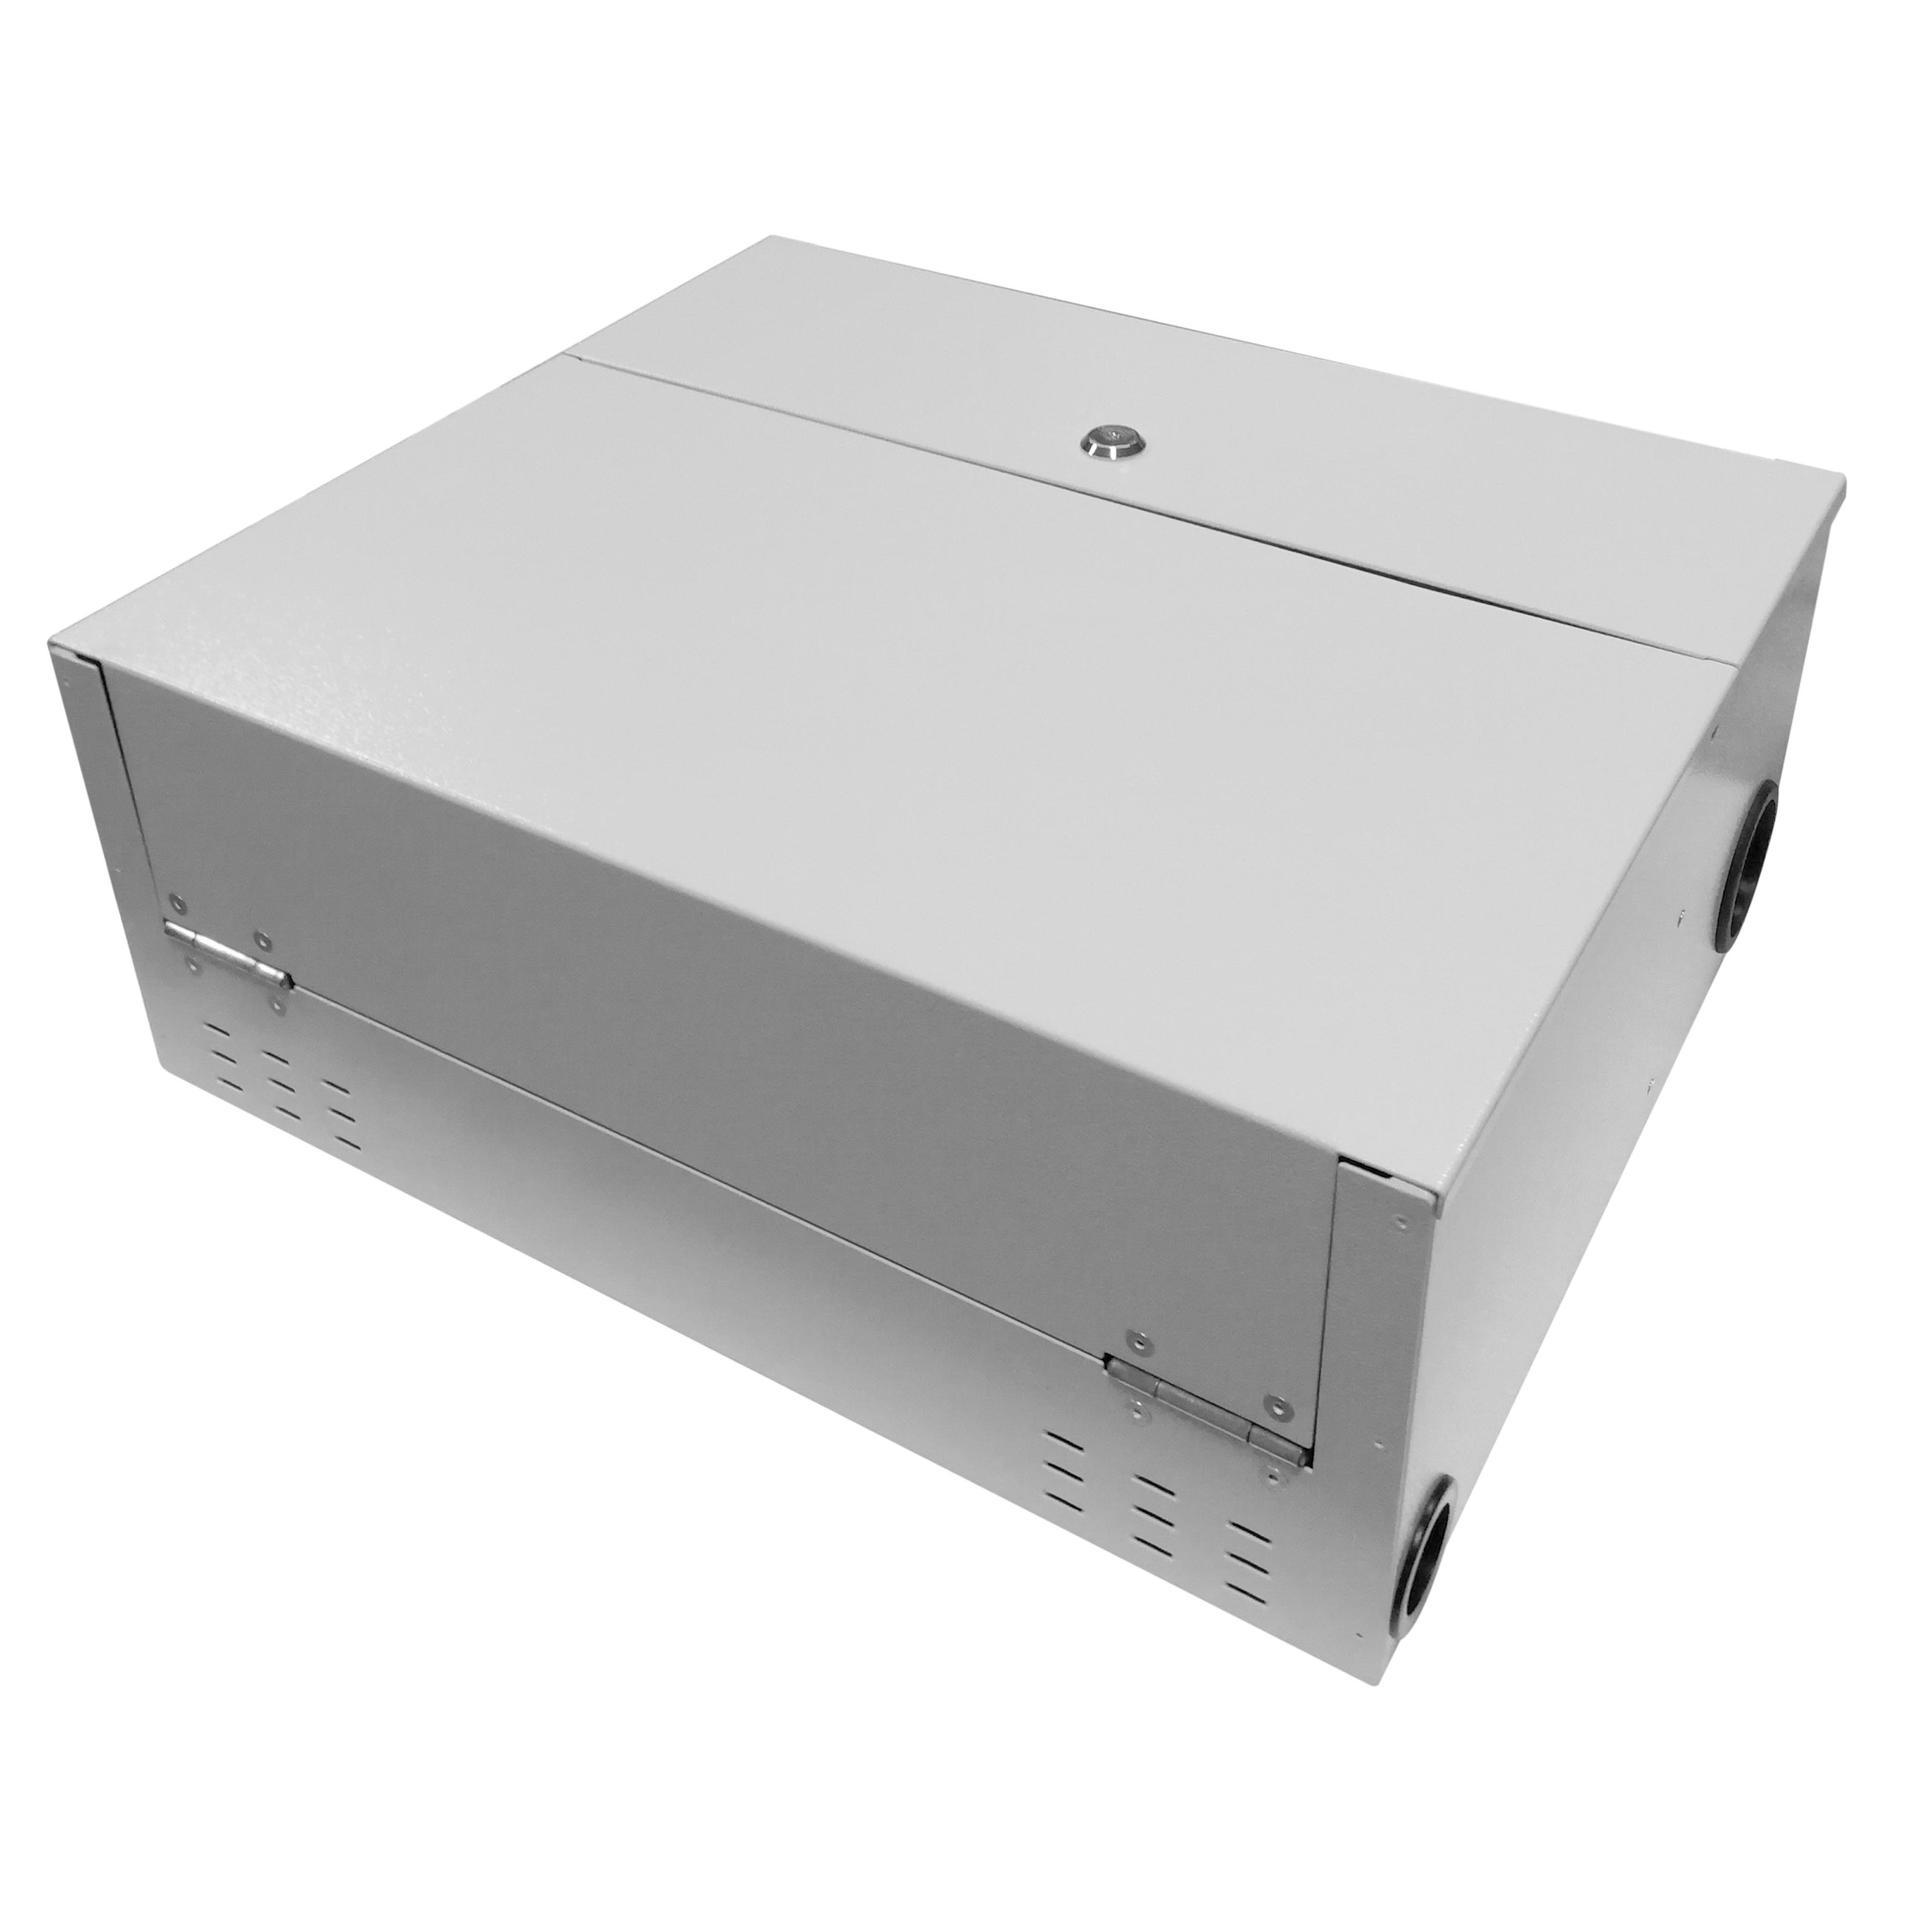 96 Port WODF Fiber Optic Distribution Box, 24 Cores Splice Tray